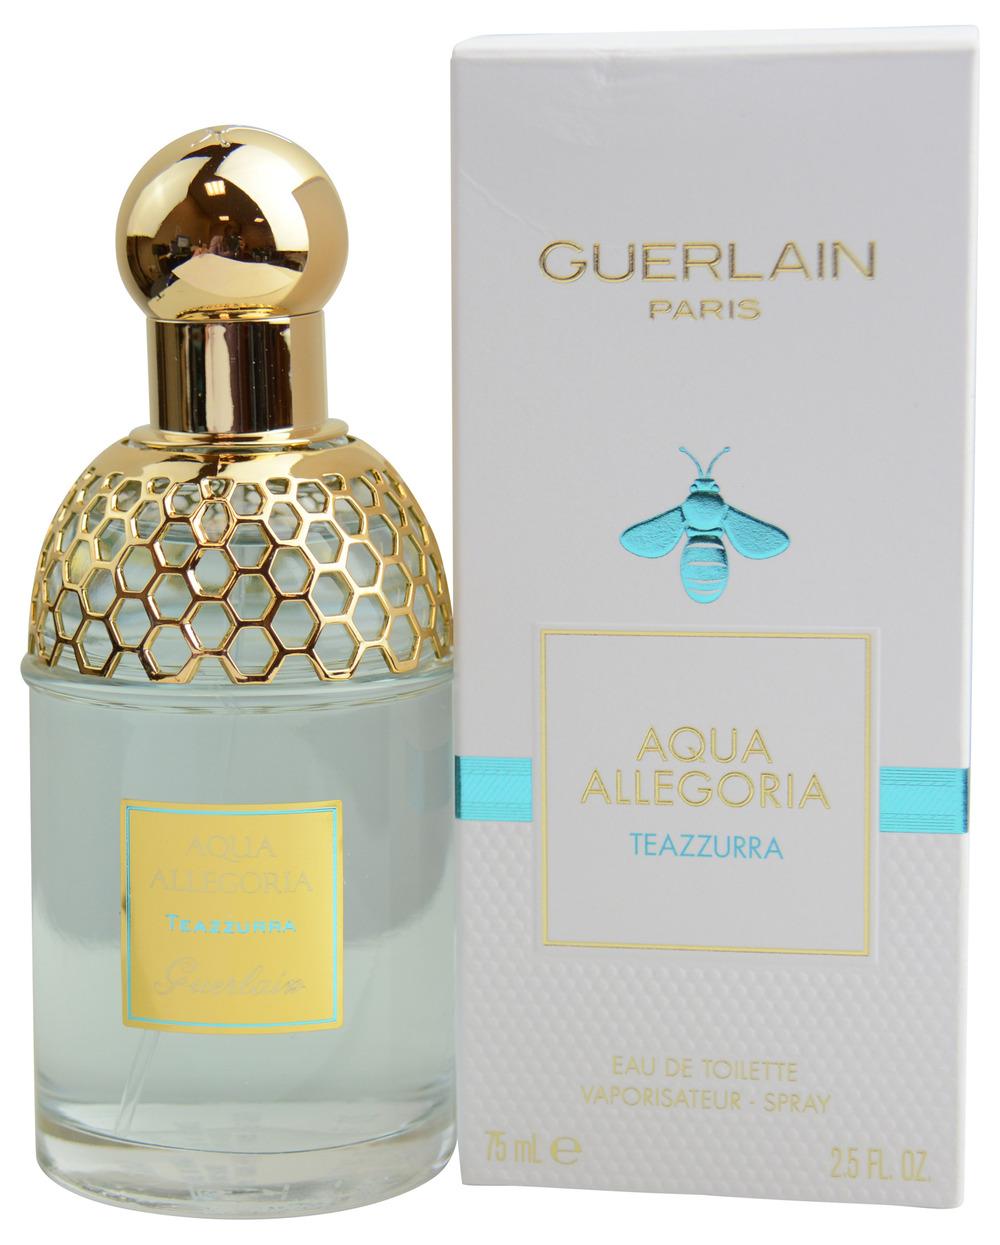 guerlain aqua allegoria teazzurra eau de toilette fragrance review eau talk the official. Black Bedroom Furniture Sets. Home Design Ideas